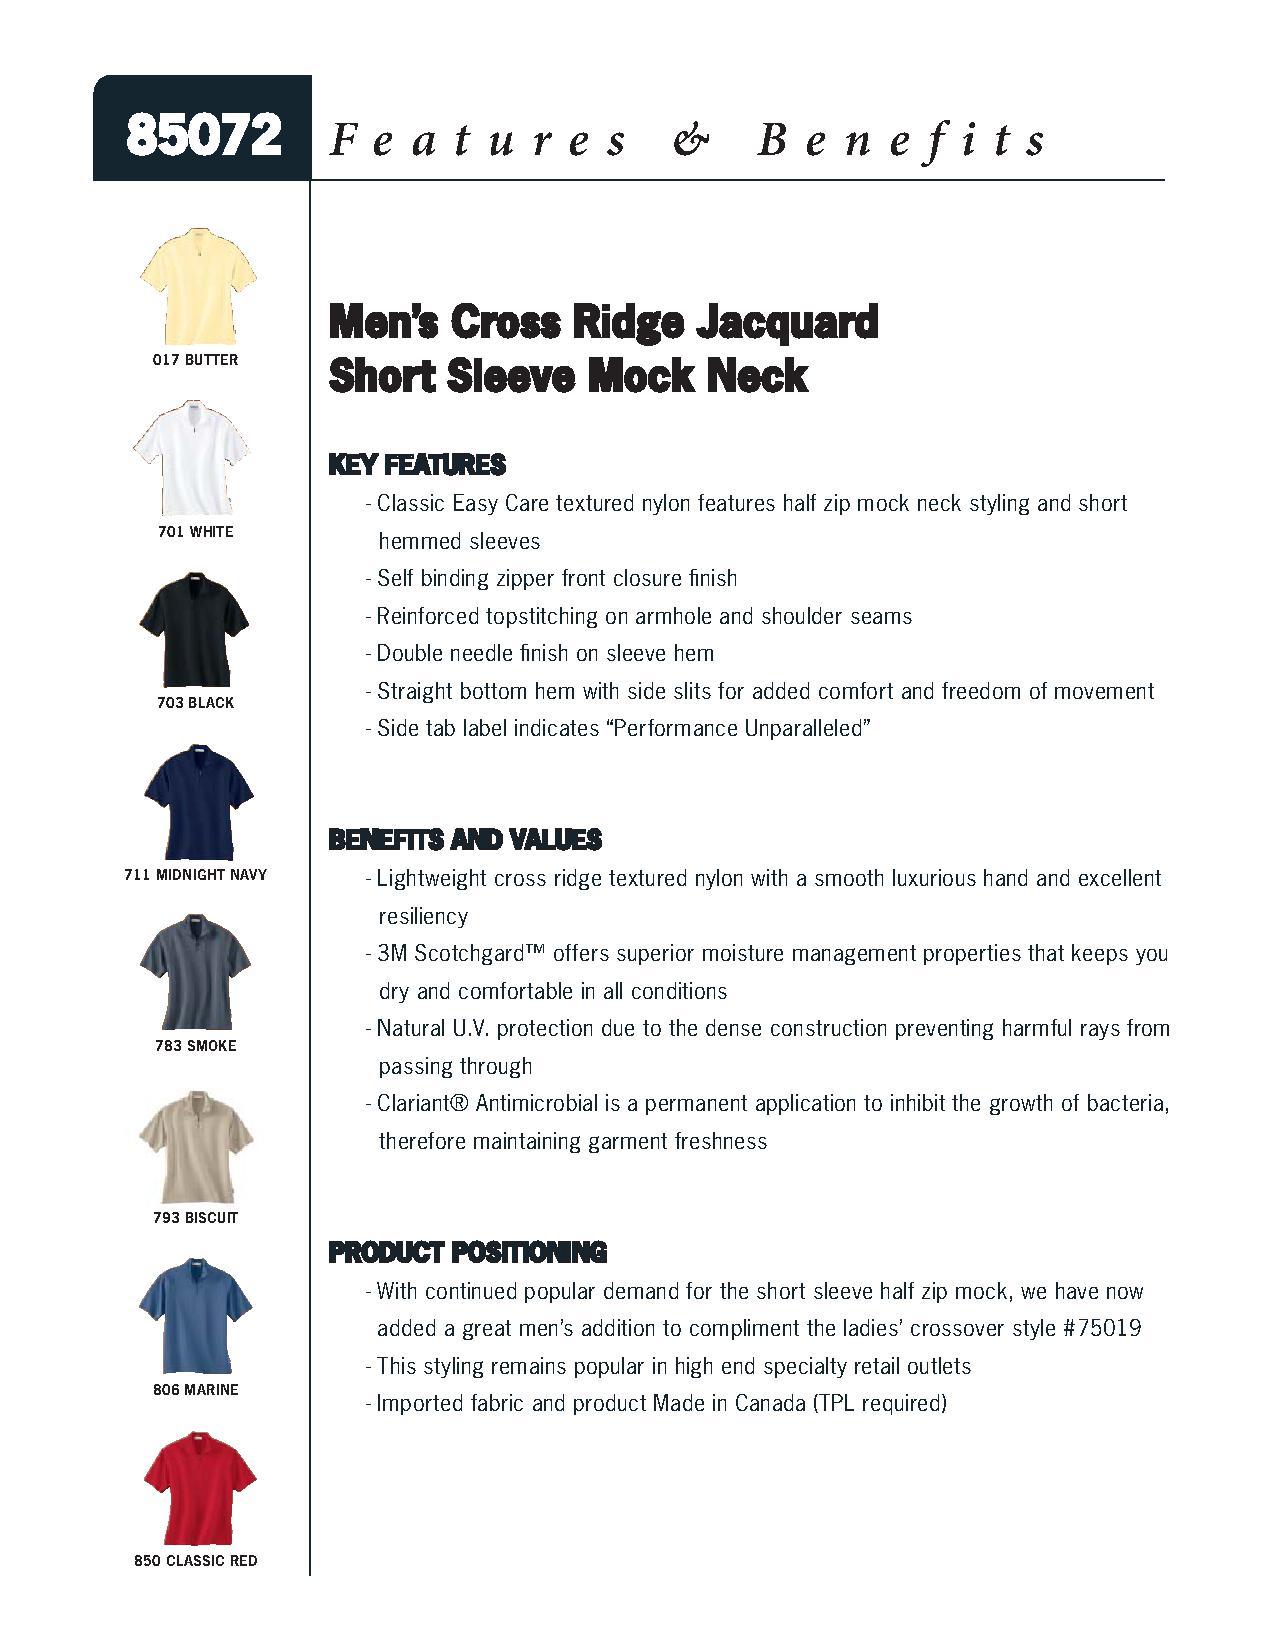 Ash City Performance 85072 - Men's Cross Ridge Jacquard Short Sleeve Half Zip Mock Neck